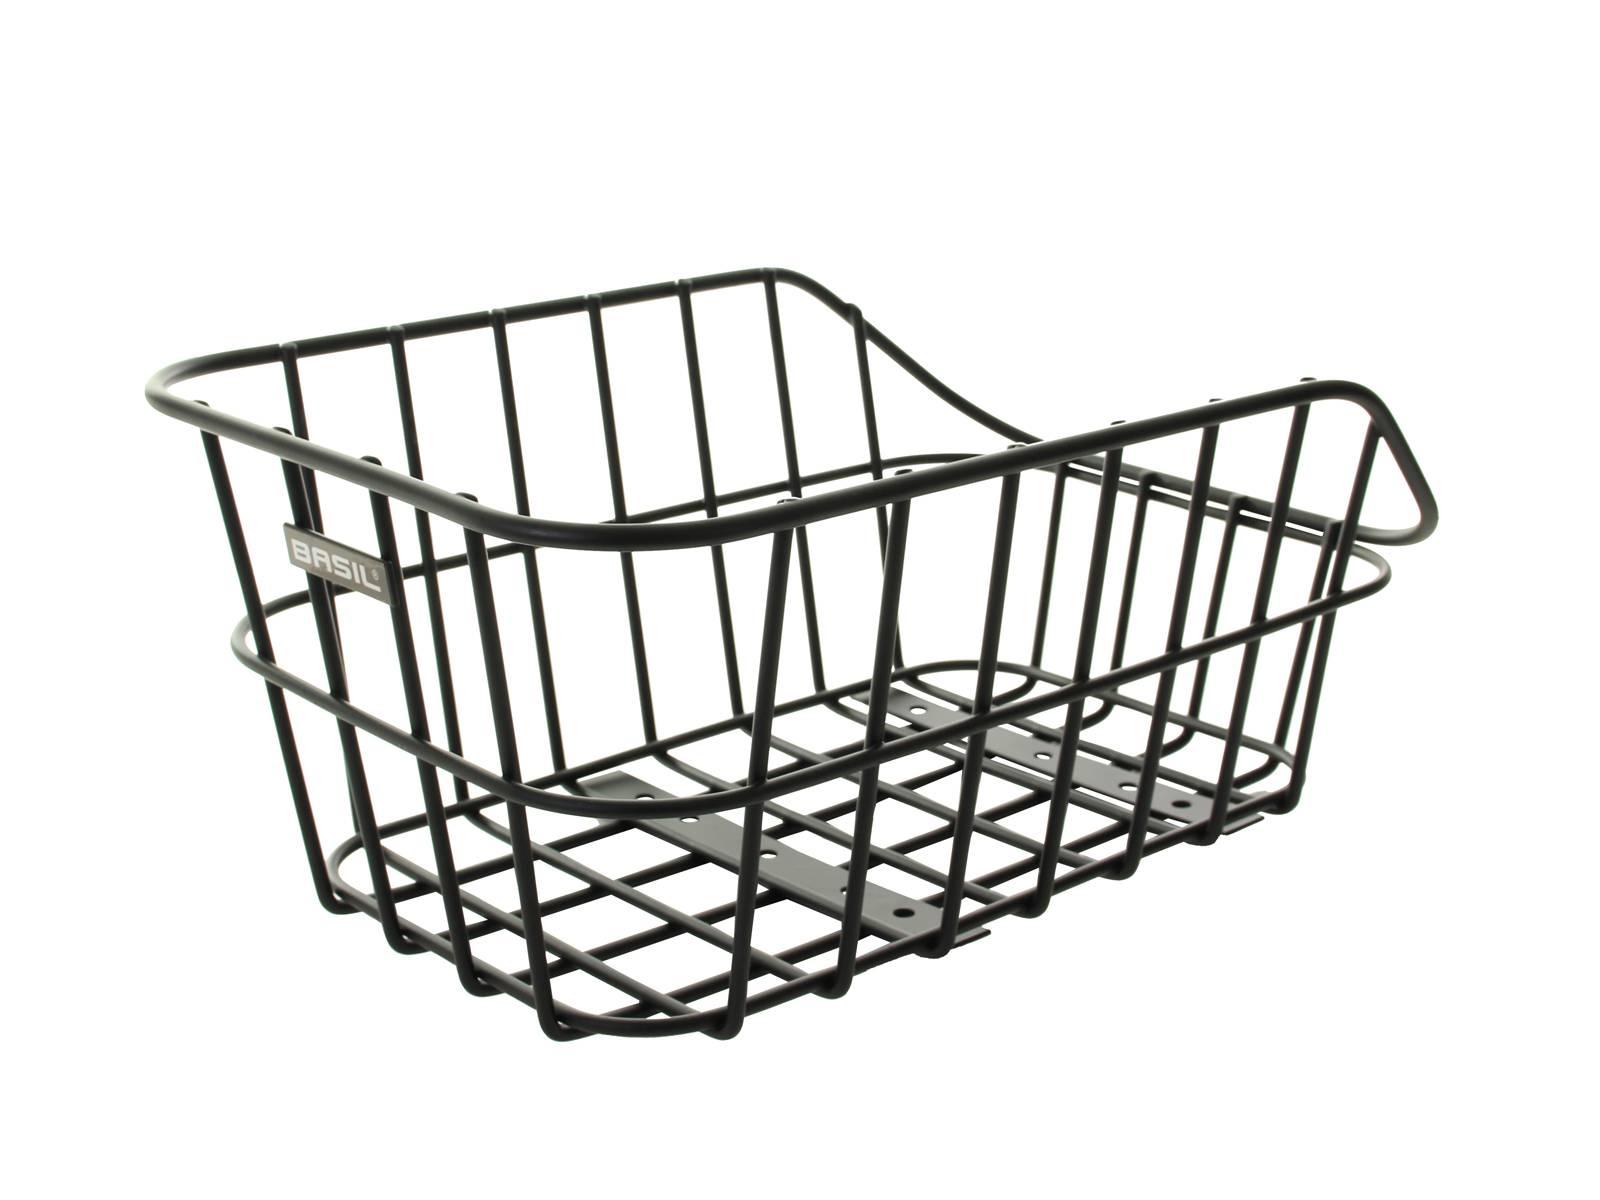 basil fahrradkorb hinten cento alu schwarz fahrradkomfort. Black Bedroom Furniture Sets. Home Design Ideas